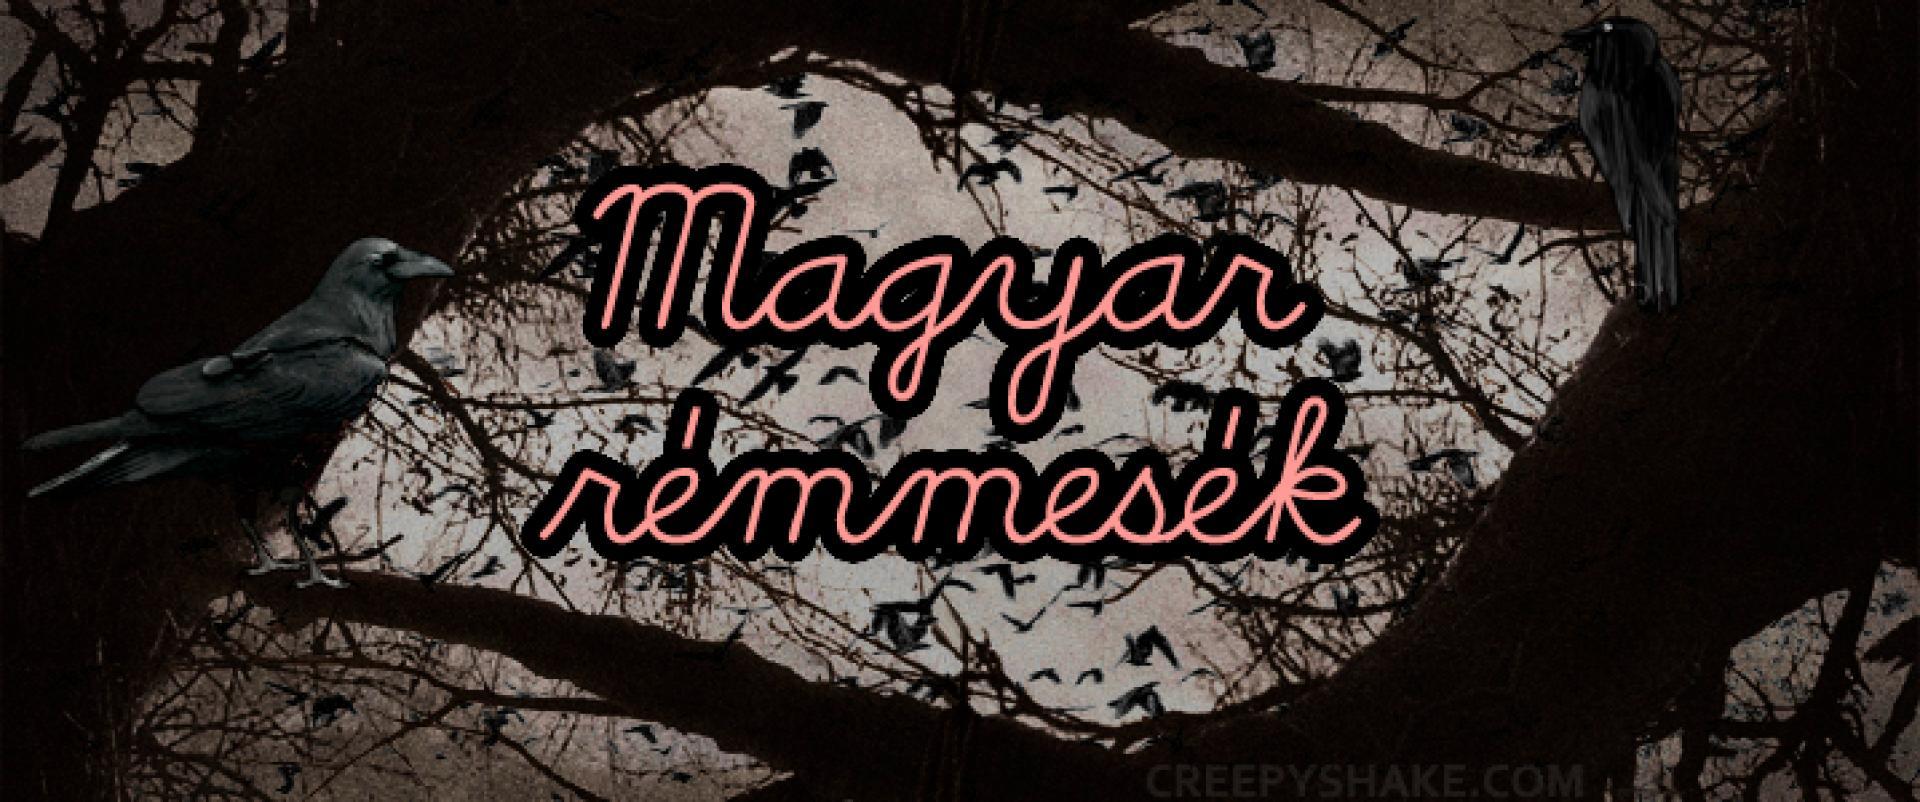 Hungarian Horror Story: Magyar rémmesék